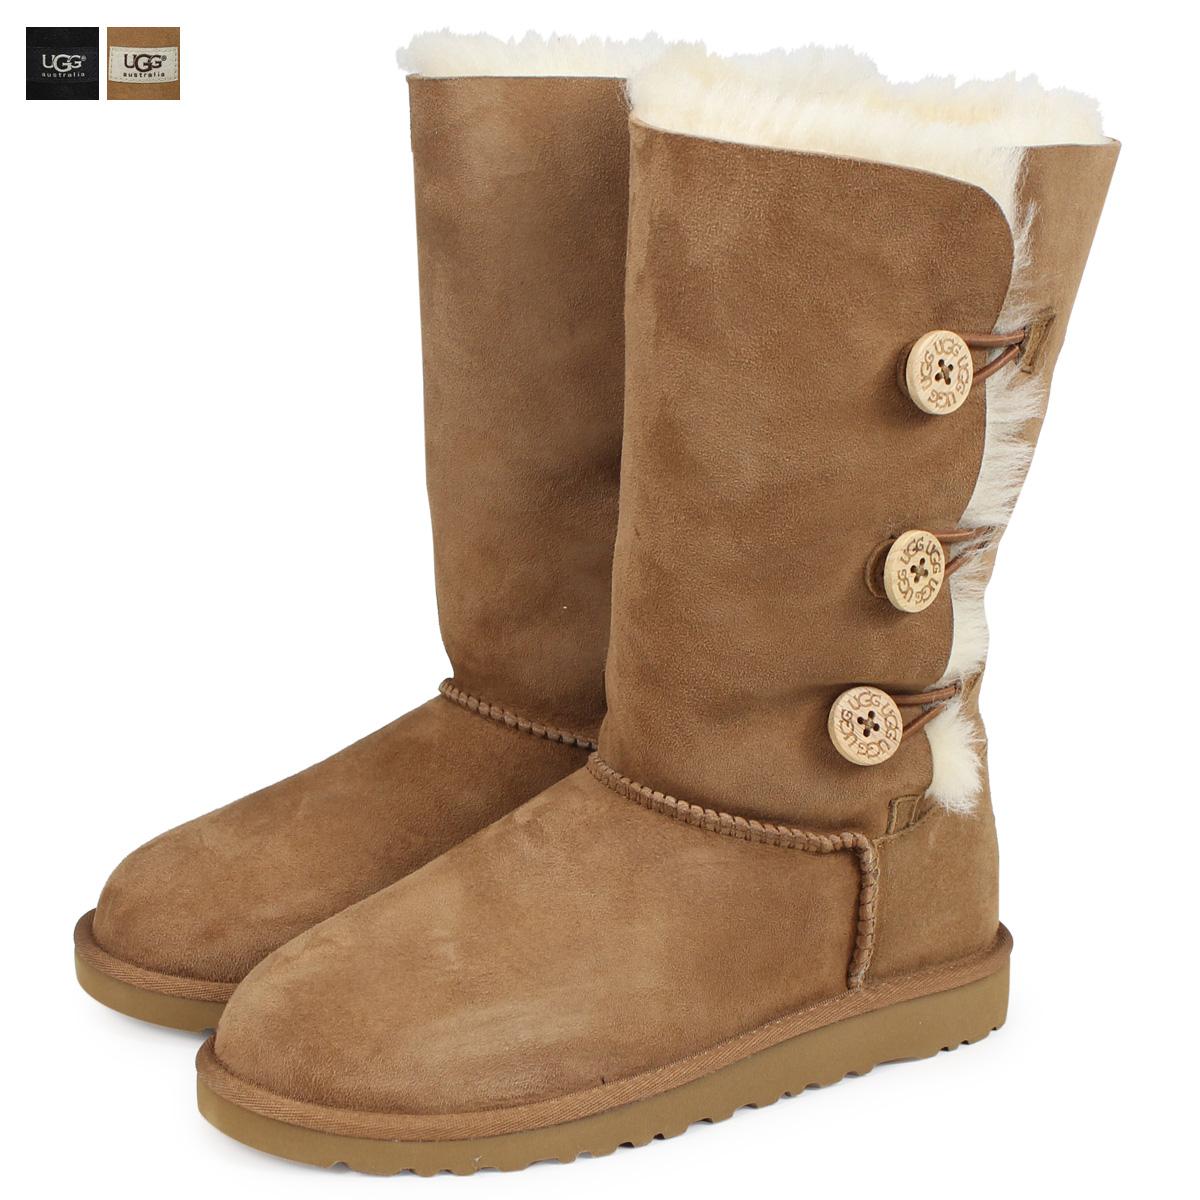 7157c0e6891 UGG UGG kids Bailey button boots KIDS BAILEY BUTTON TRIPLET 1962YK  Sheepskin ladies